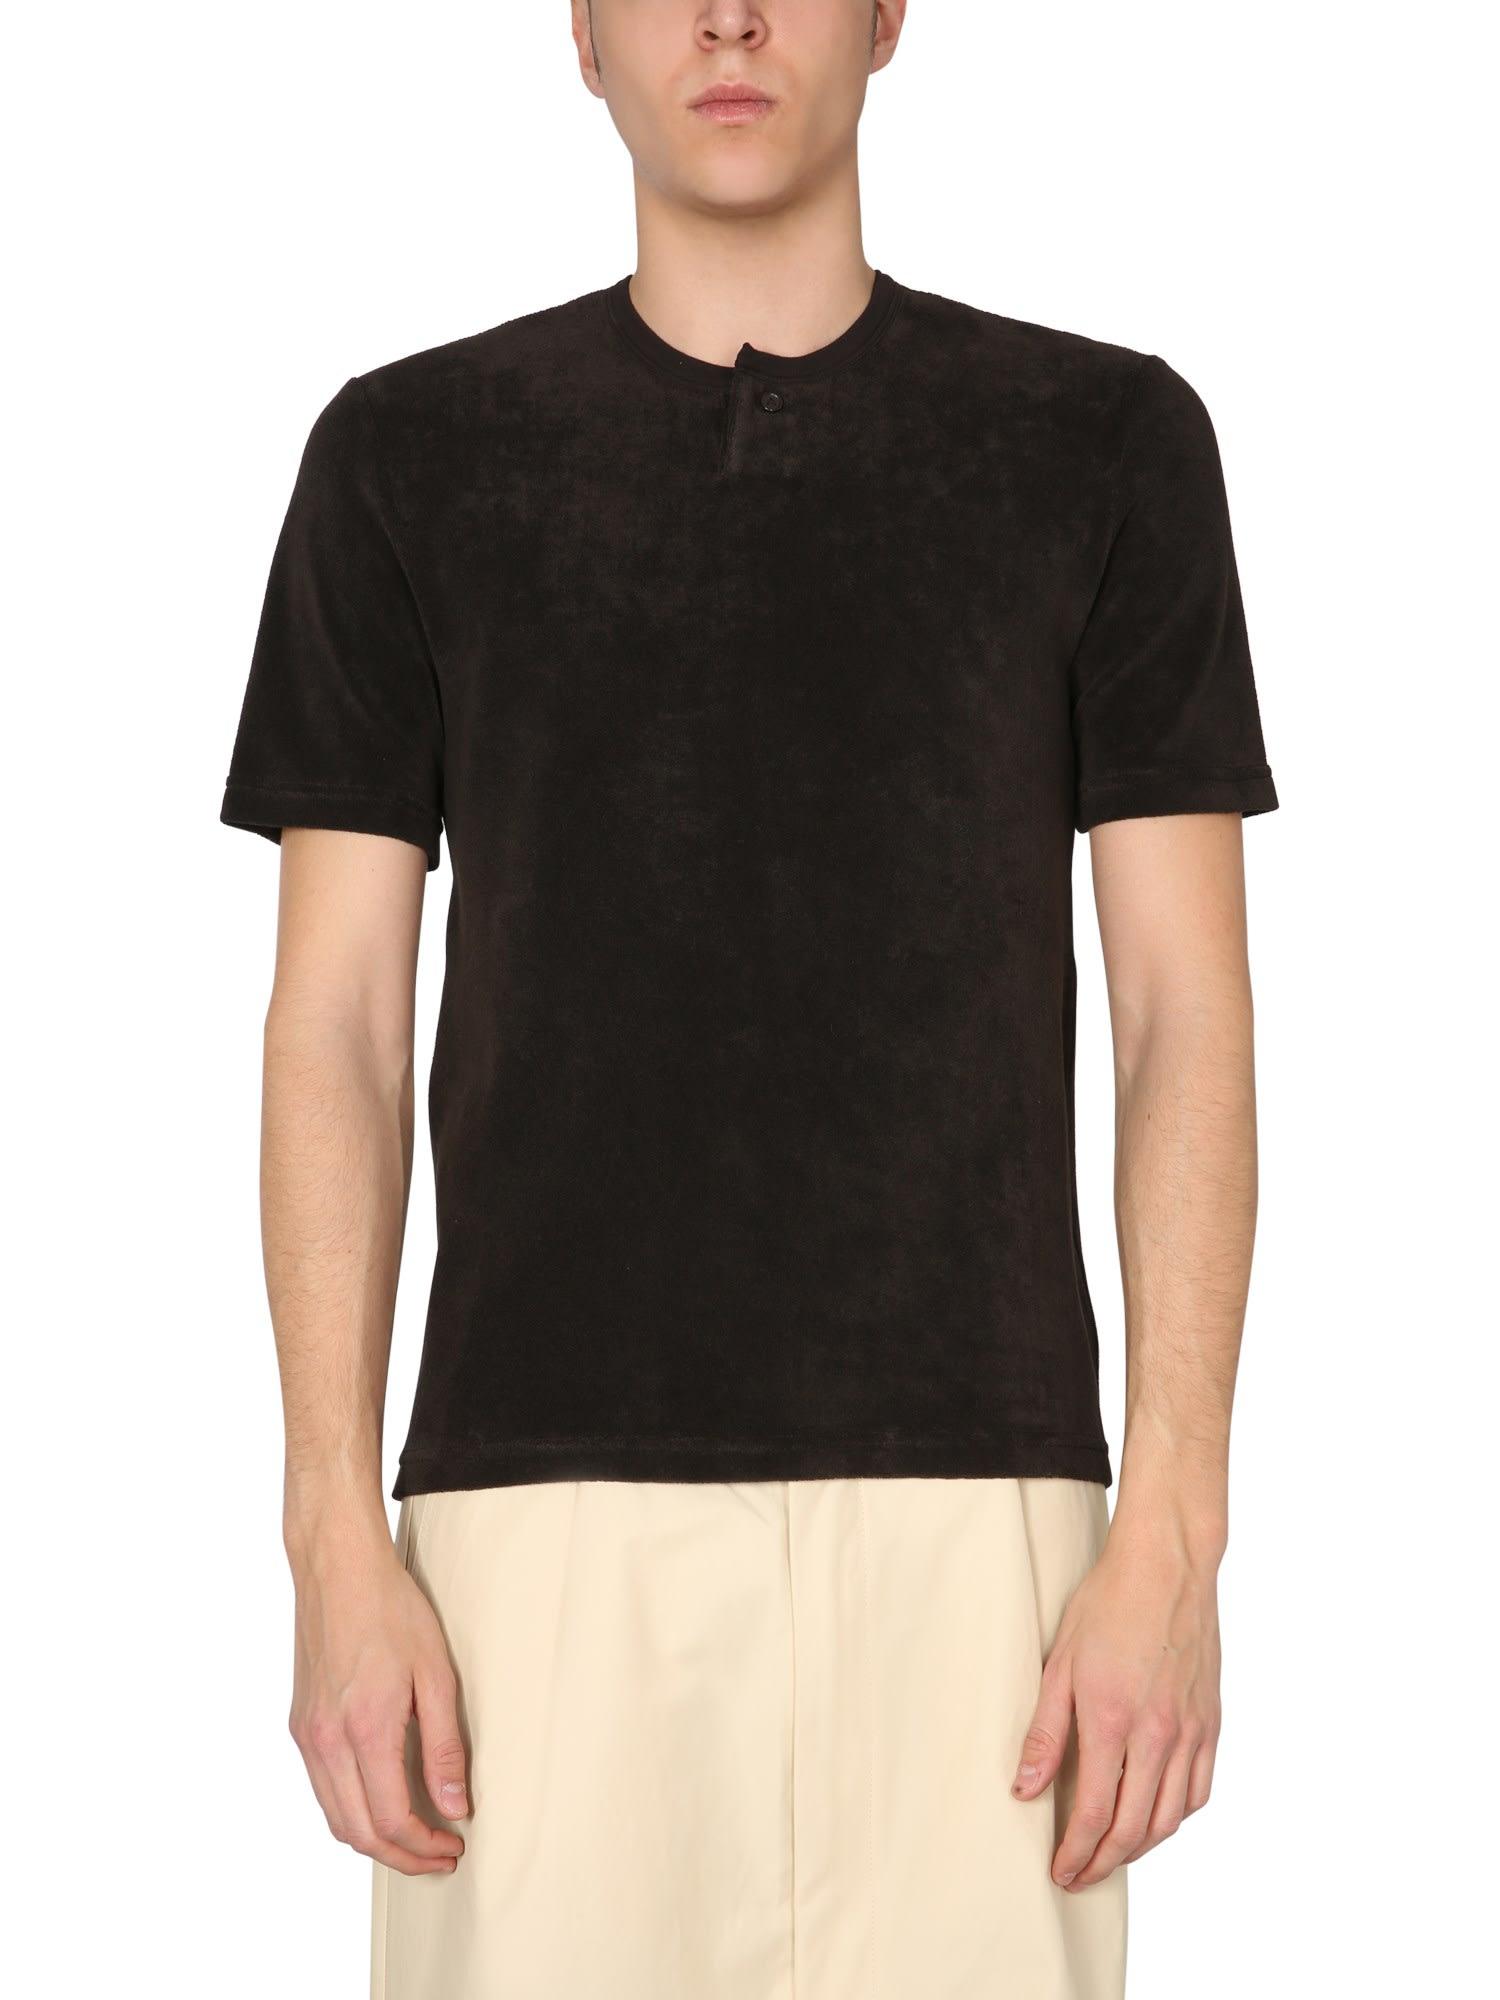 Bottega Veneta T-shirts REGULAR FIT T-SHIRT